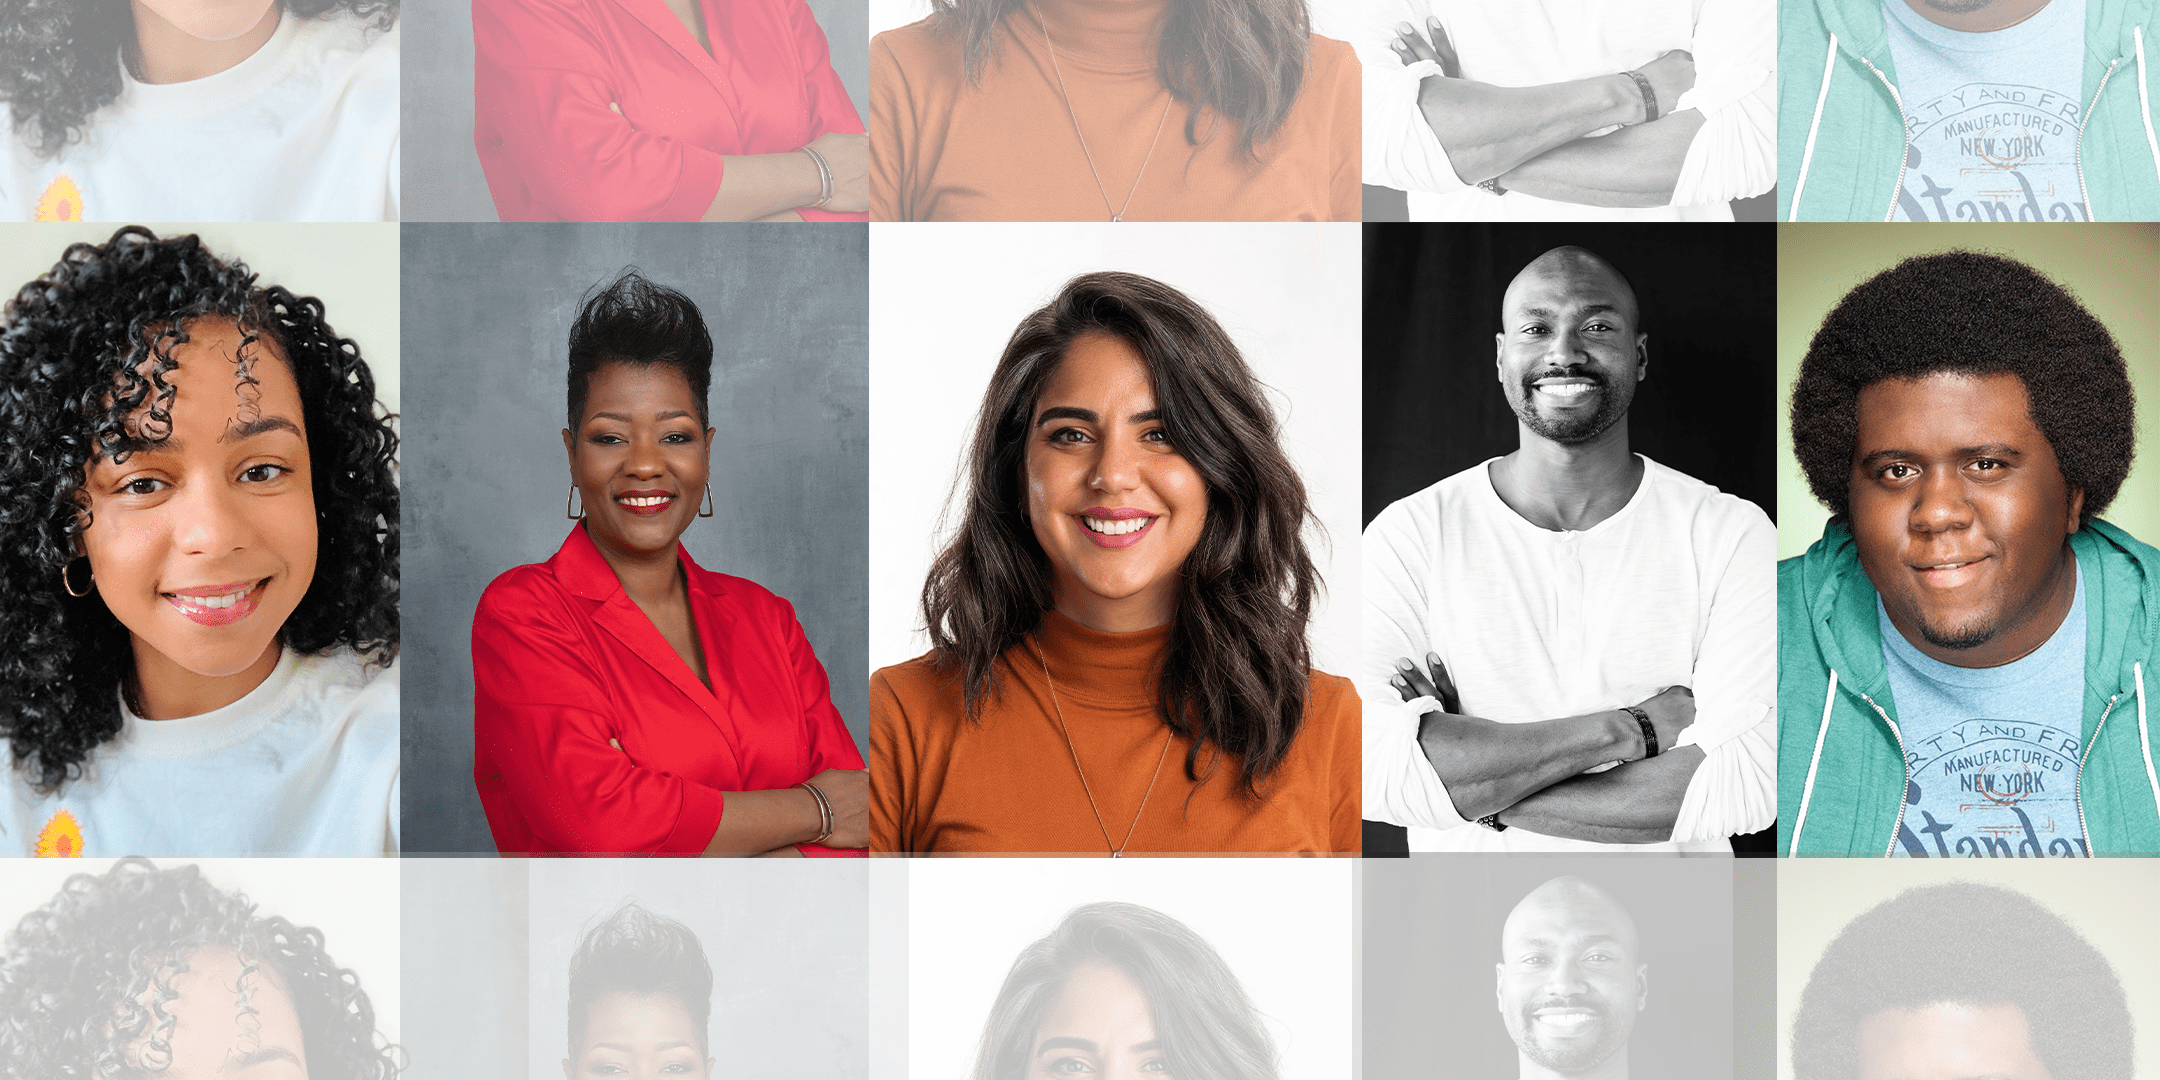 Photos of moderator Maurice Cherry and speakers Earl Gray, Elaine Lopez, Marlene Marmolejos, and Jacinda Walker.